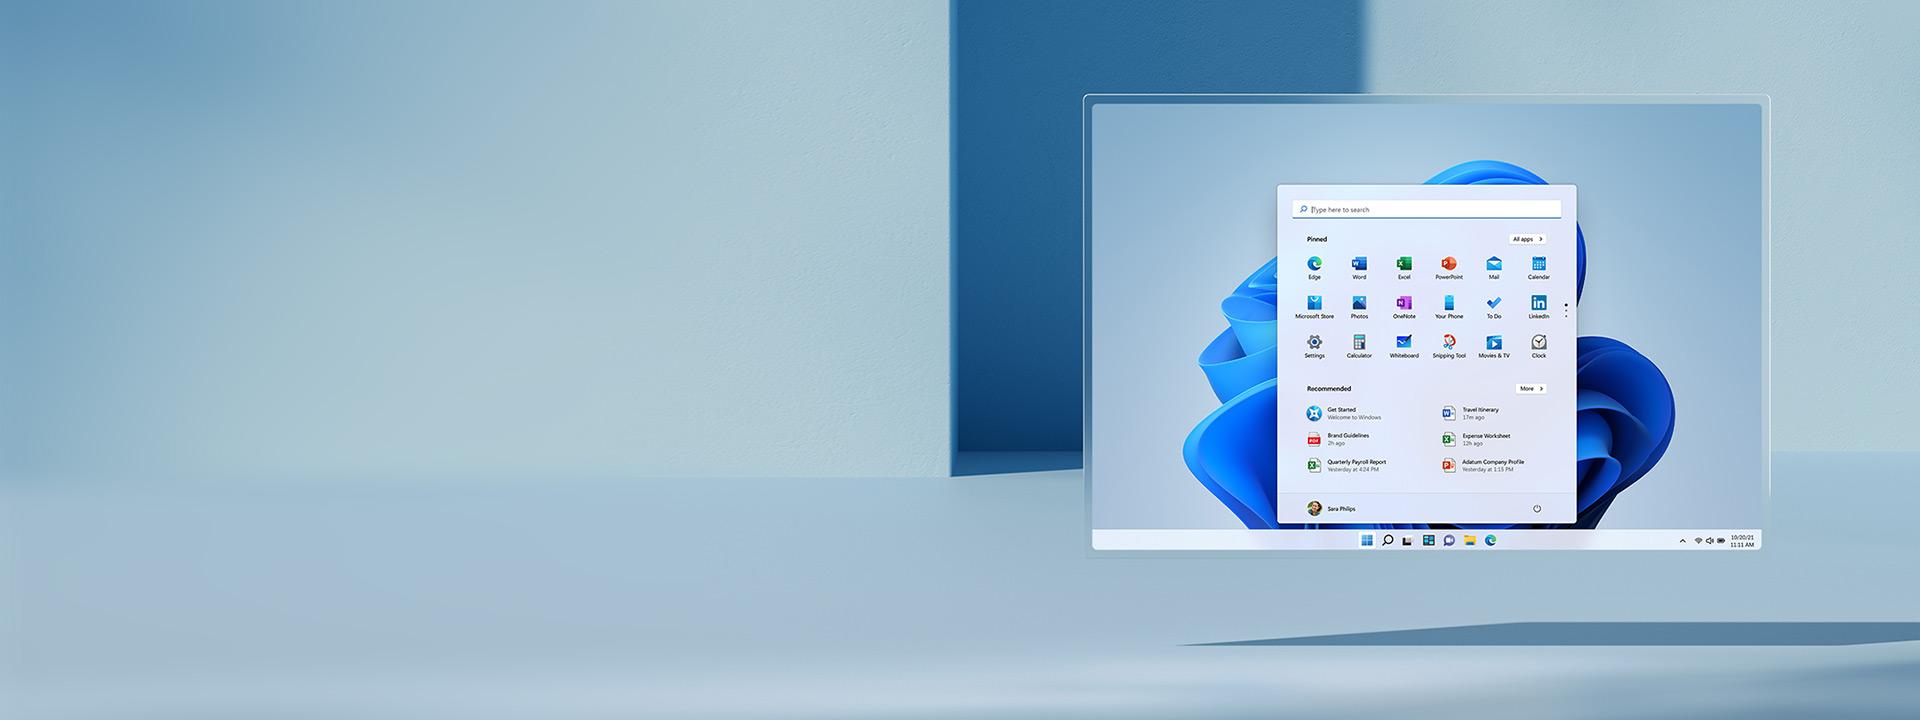 Windows 11 photo